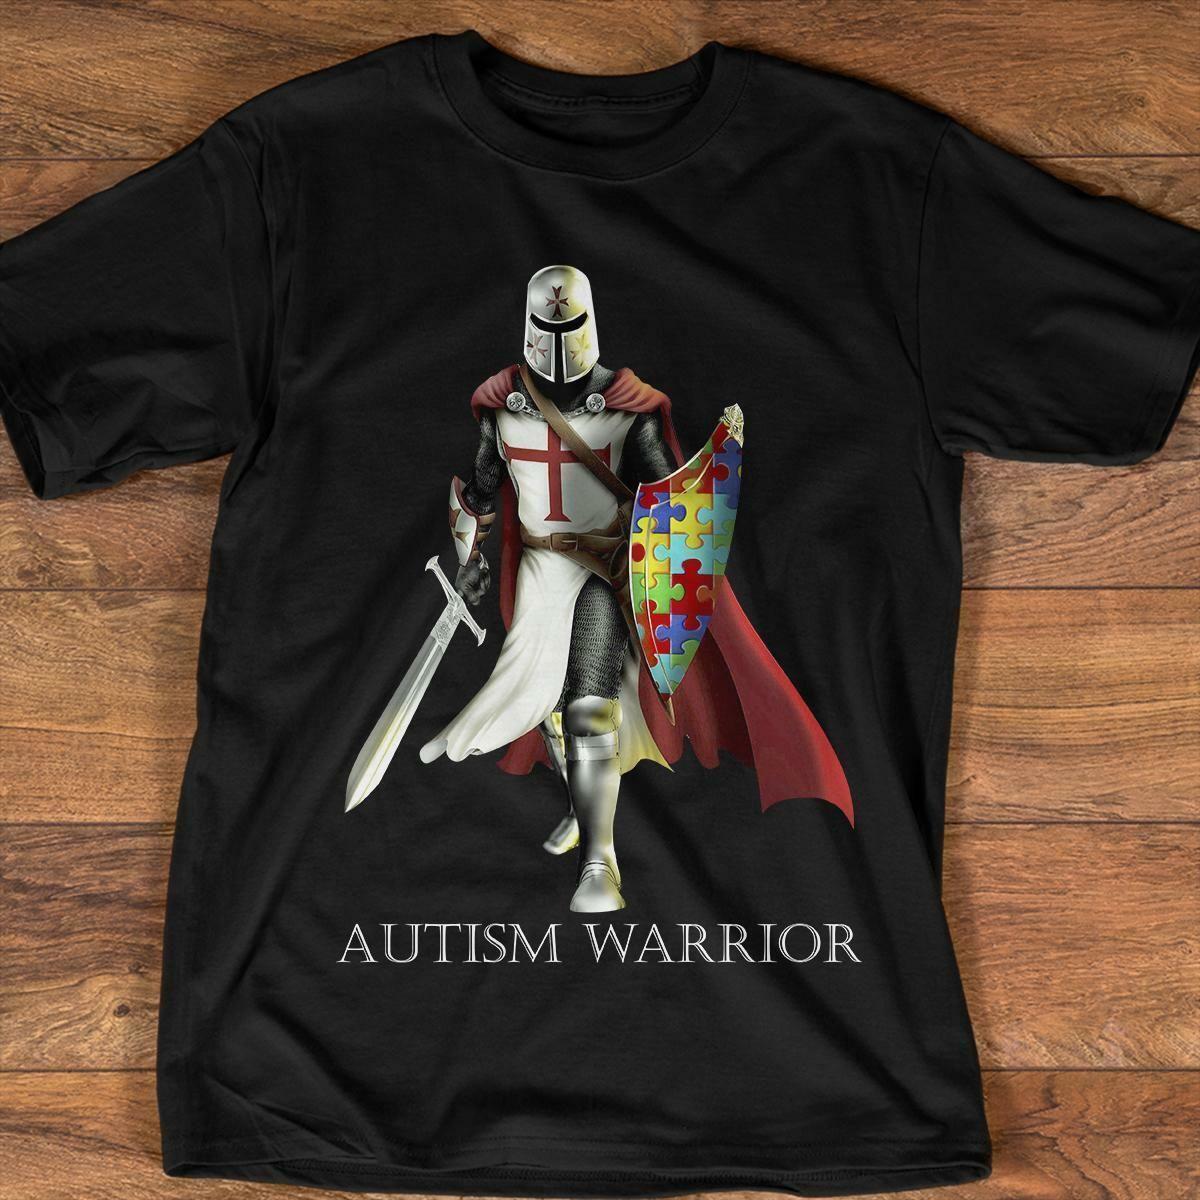 6ad853359 Autism Knights Templar Autism Warrior T Shirt Black Cotton Men S 6XL US  Supplier Men Women Unisex Fashion Tshirt Neck T Shirts T Shirts Only From  ...